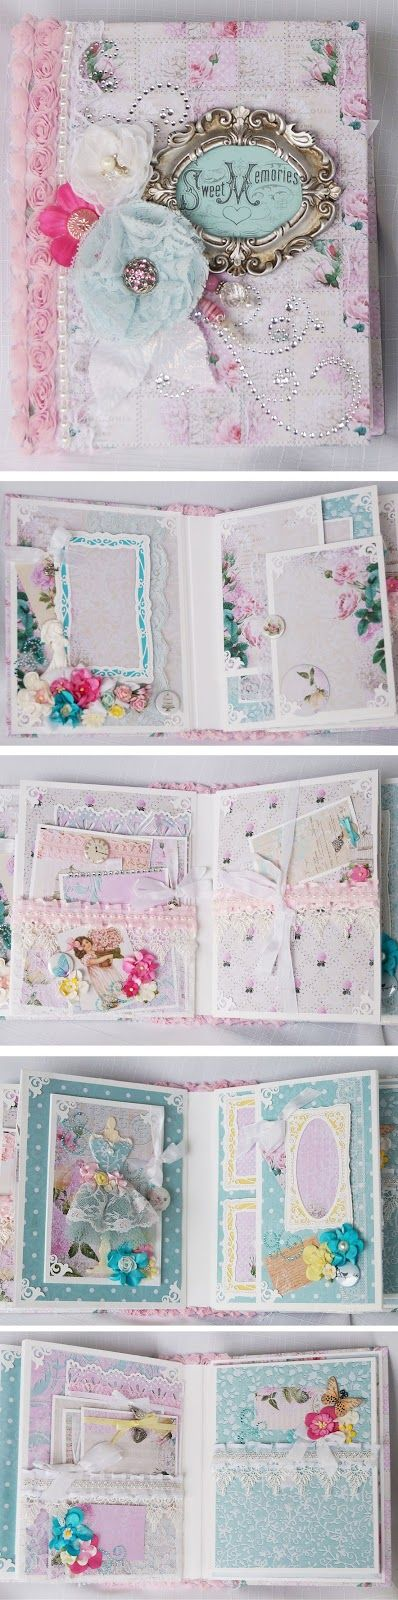 "Terry's Scrapbooks: Lemon Craft - ""Dreamy Mornings"" mini album"